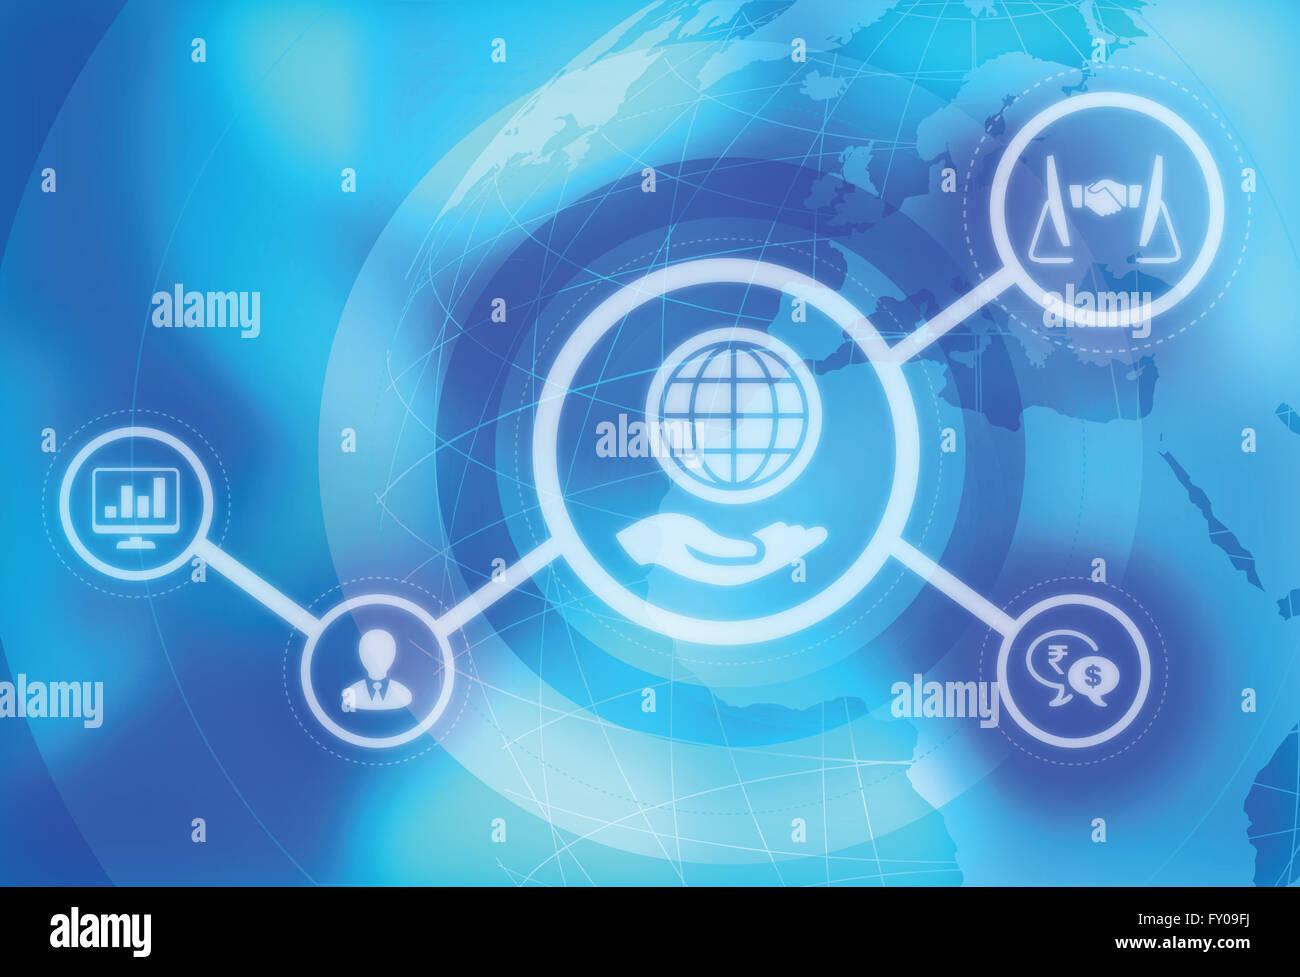 Illustrative image representing business globalization - Stock Image